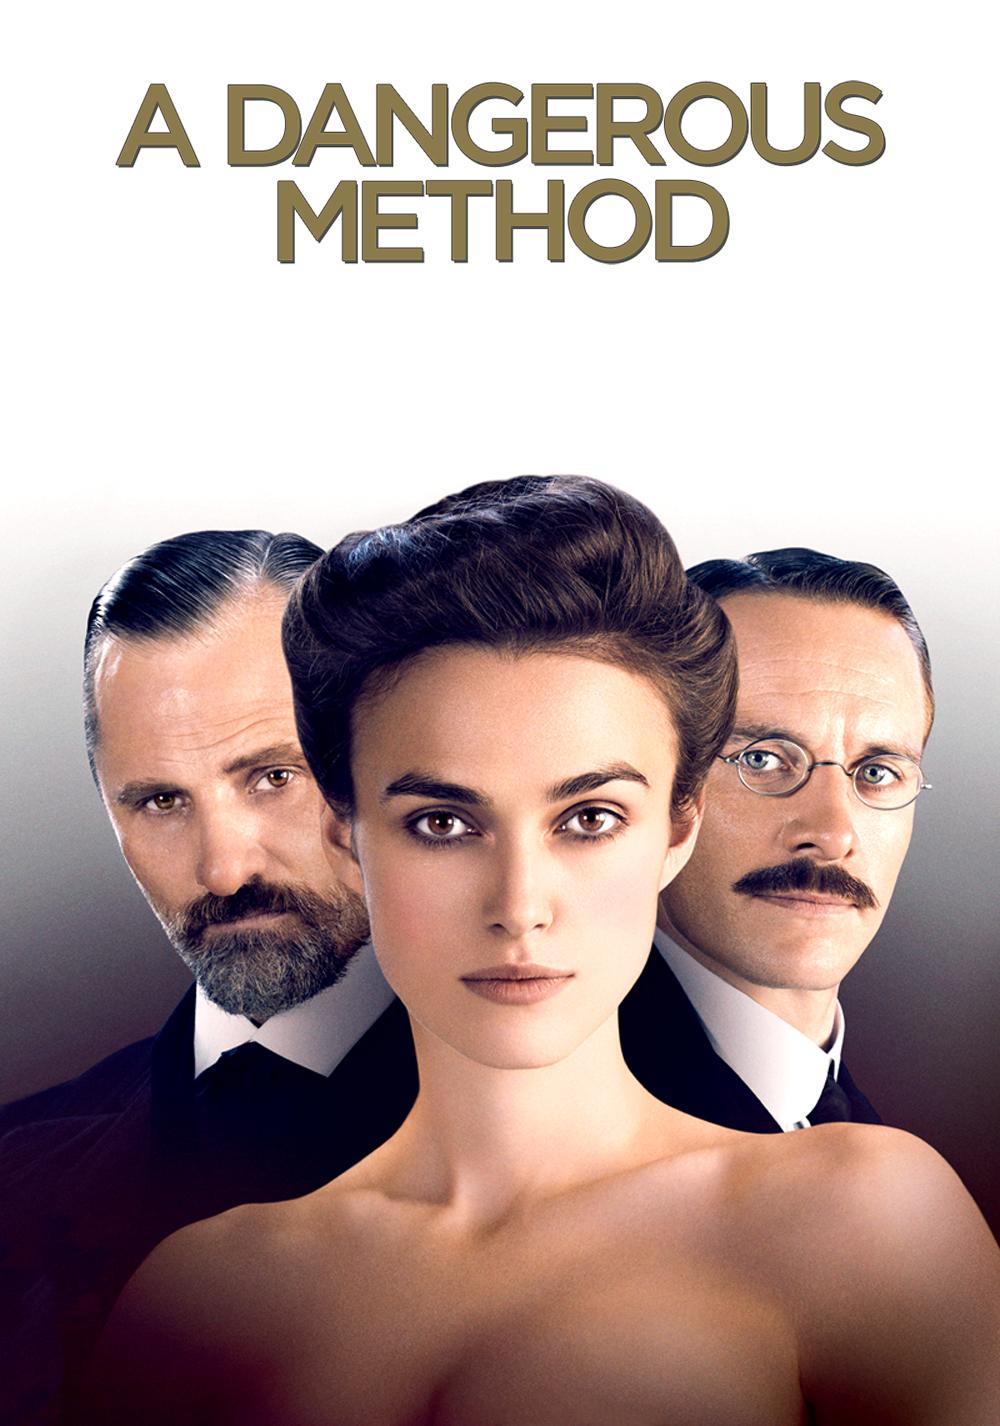 A Dangerous Method | Movie fanart | fanart.tv A Dangerous Method Poster